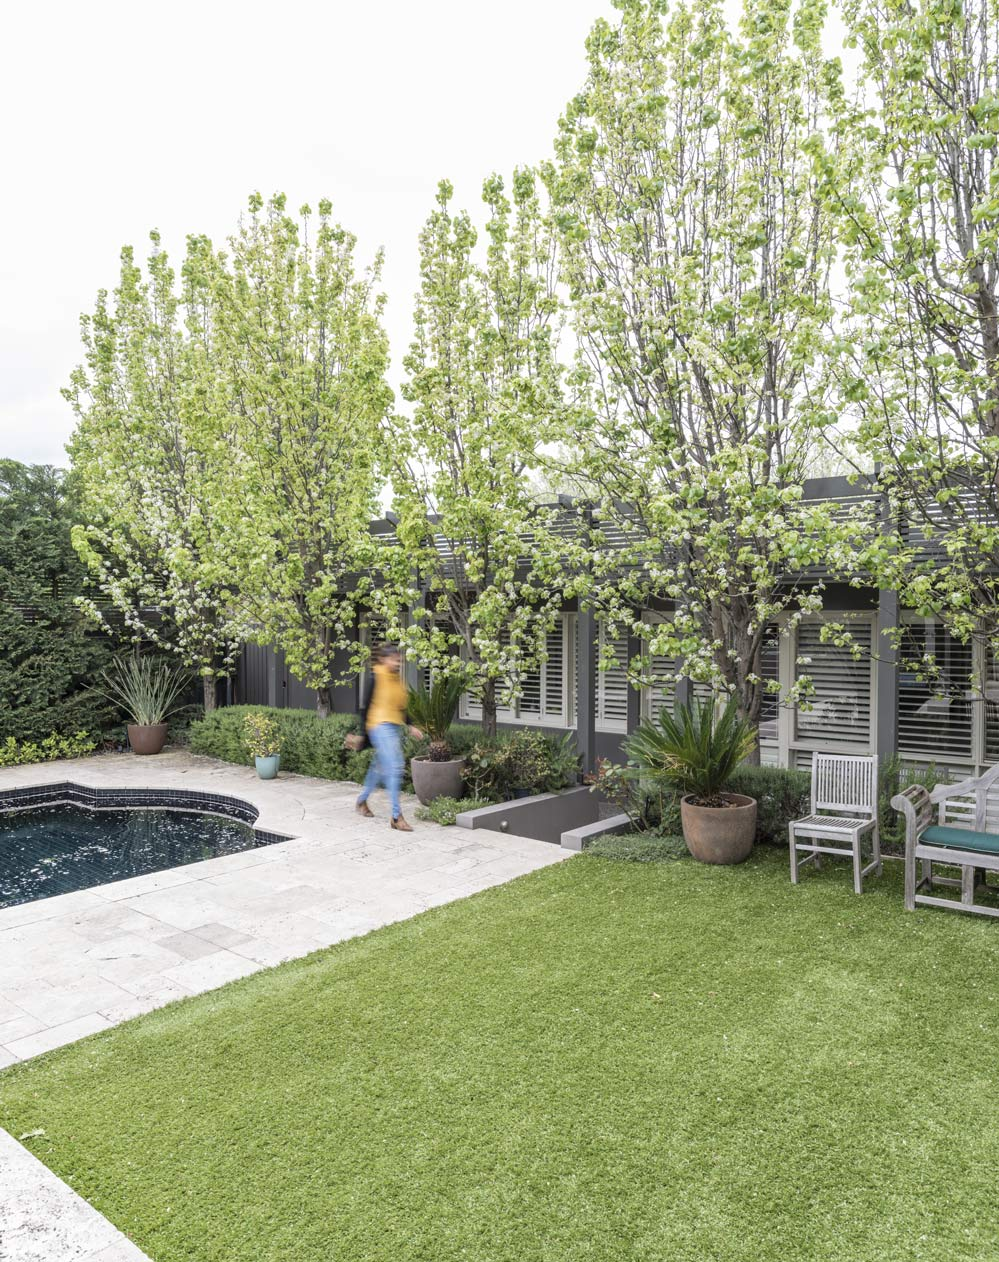 Armadale Granny Flats Melbourne | Garden Studios Melbourne